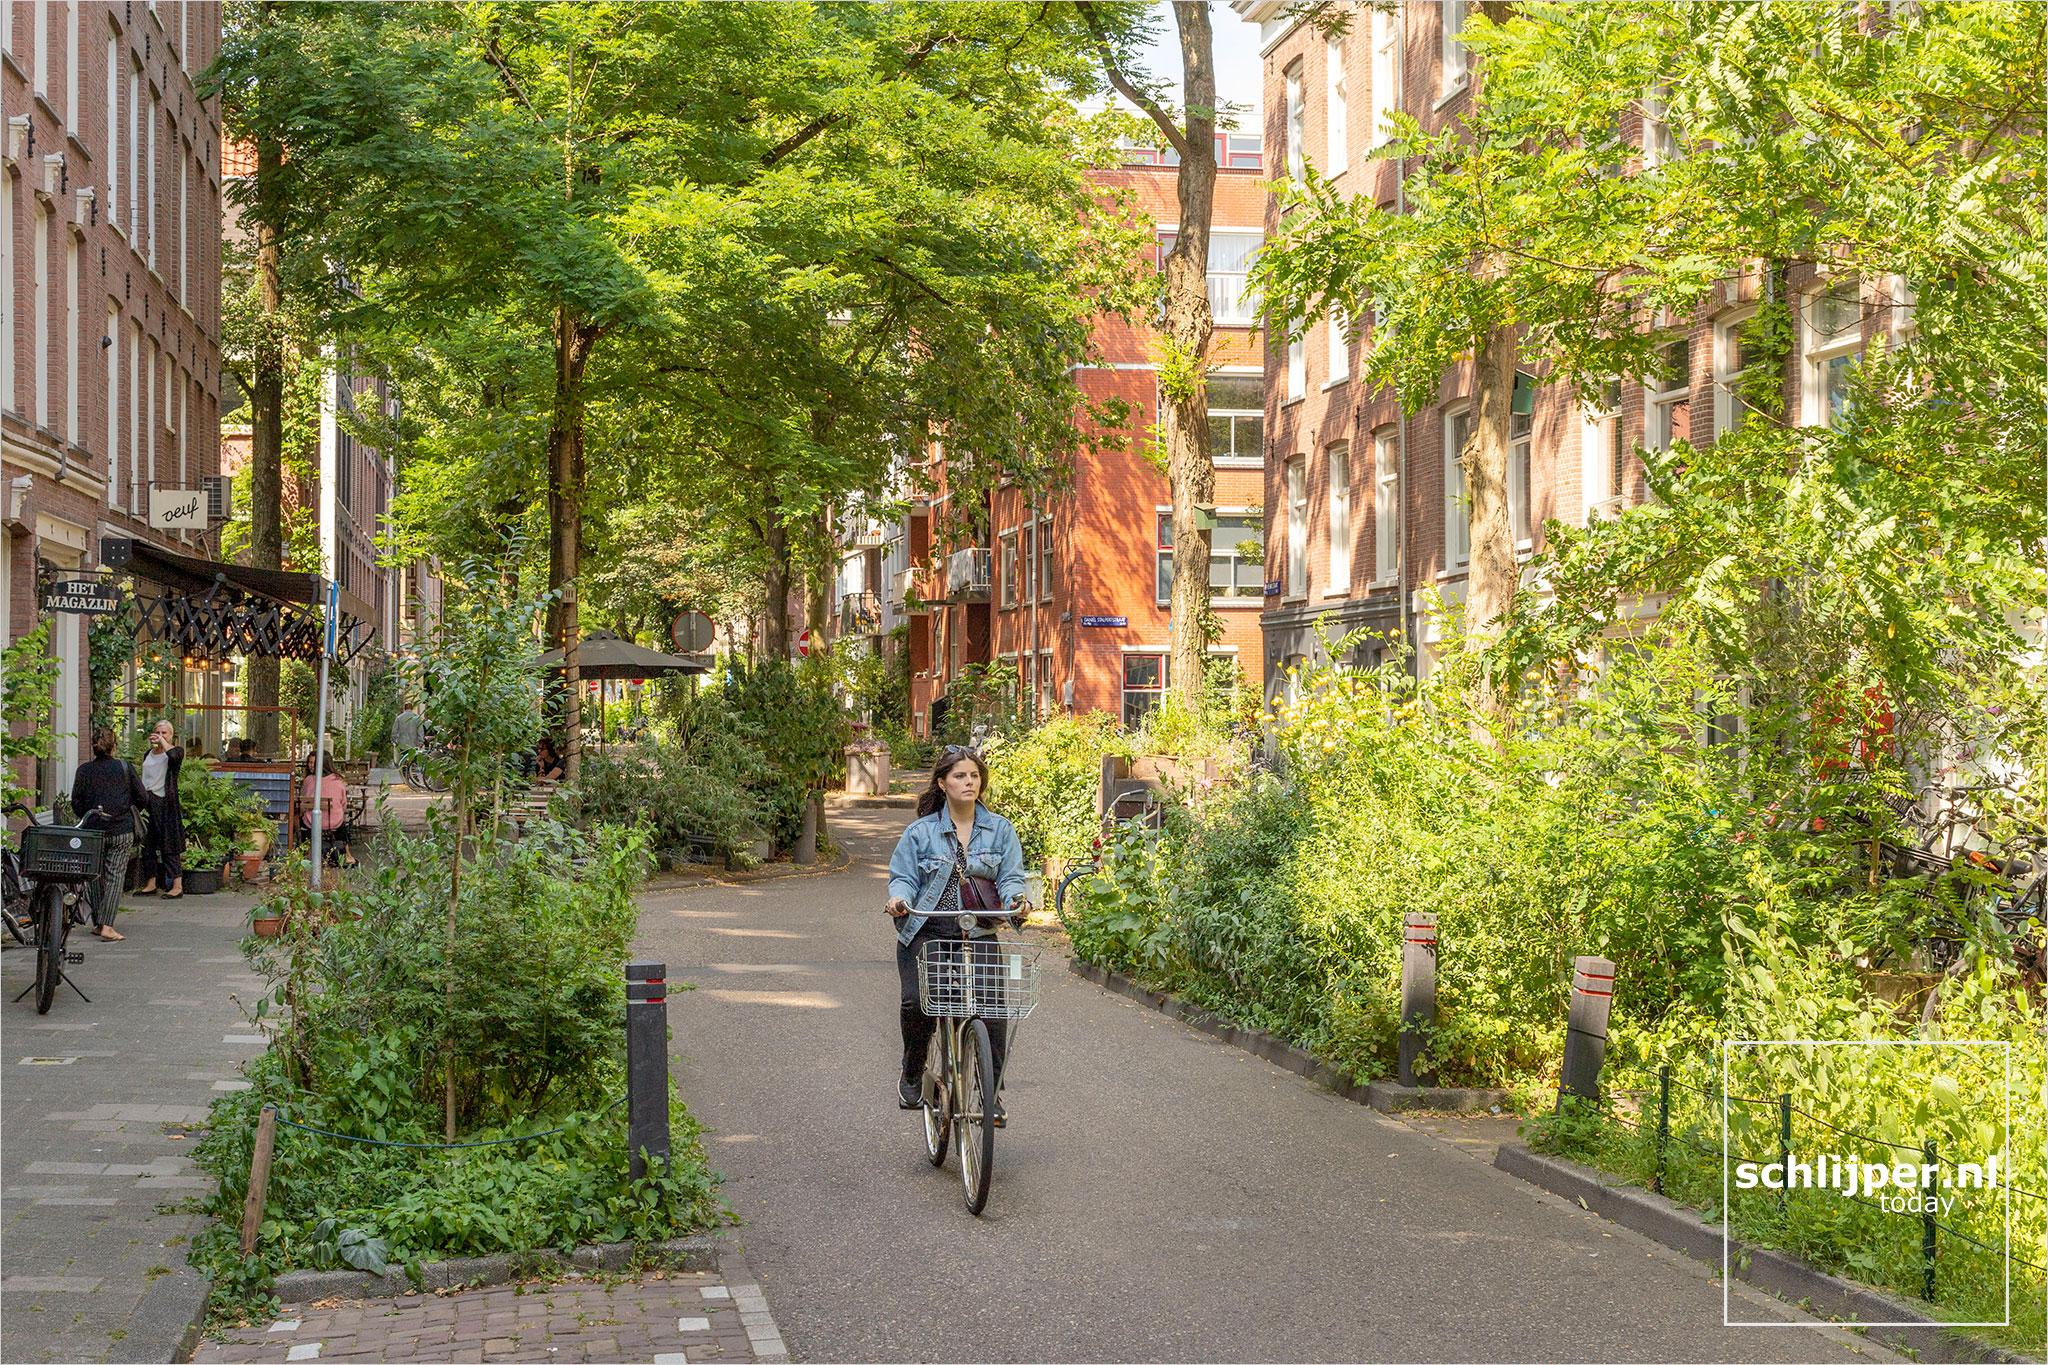 The Netherlands, Amsterdam, 23 juli 2021